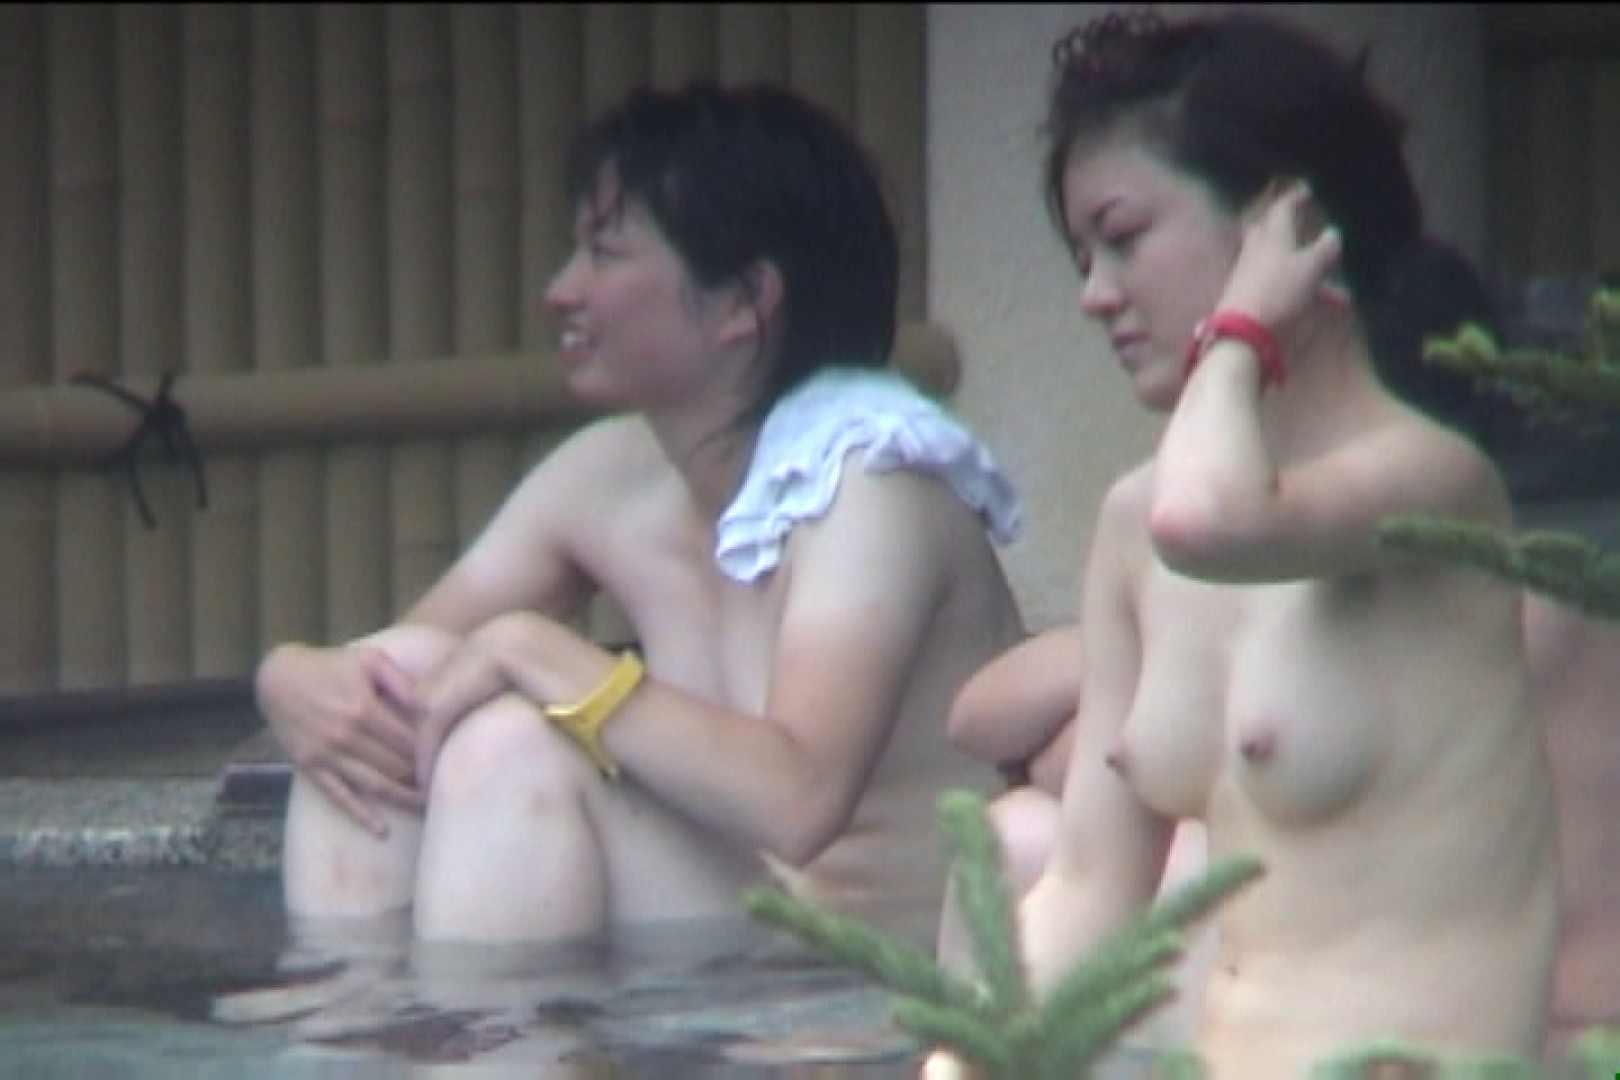 Aquaな露天風呂Vol.94【VIP限定】 OLセックス 盗撮エロ画像 79画像 26